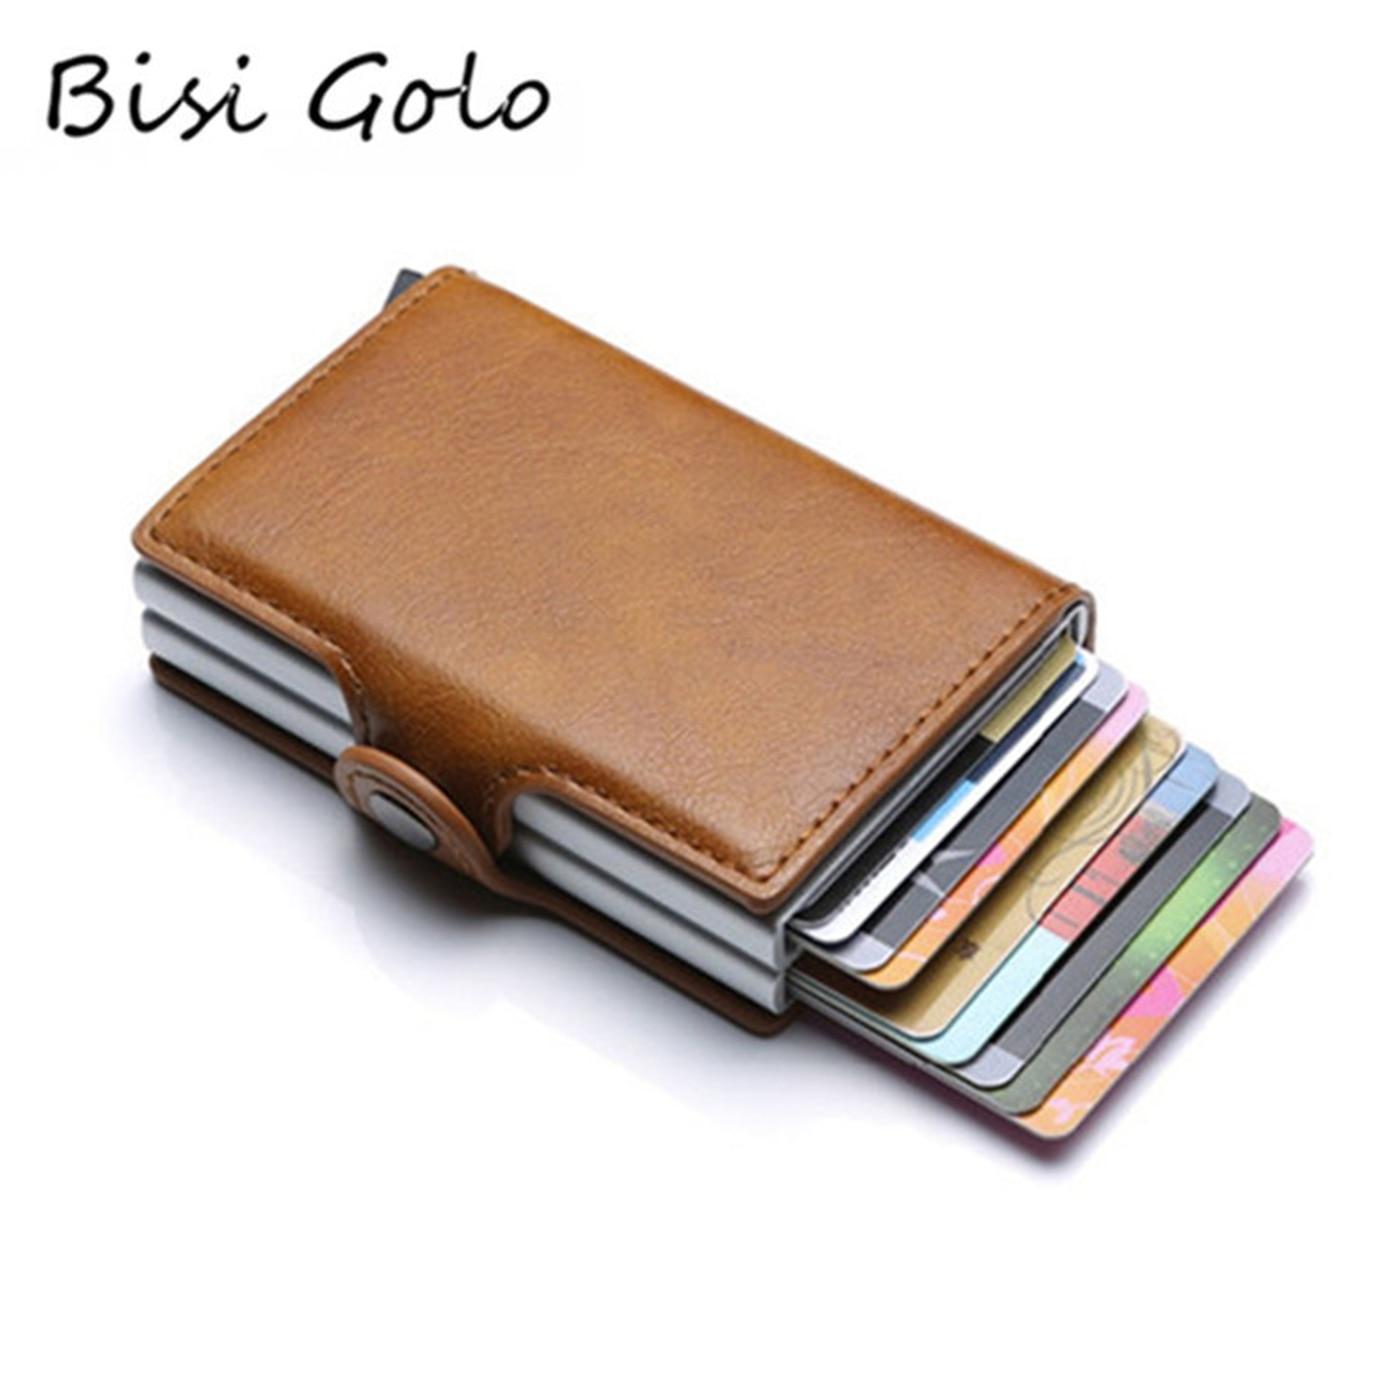 BISI GORO 2019 Wallet Business Credit Card Holder Wallet Unisex Metal Blocking RFID Wallet ID Card Case Aluminium Travel Purse